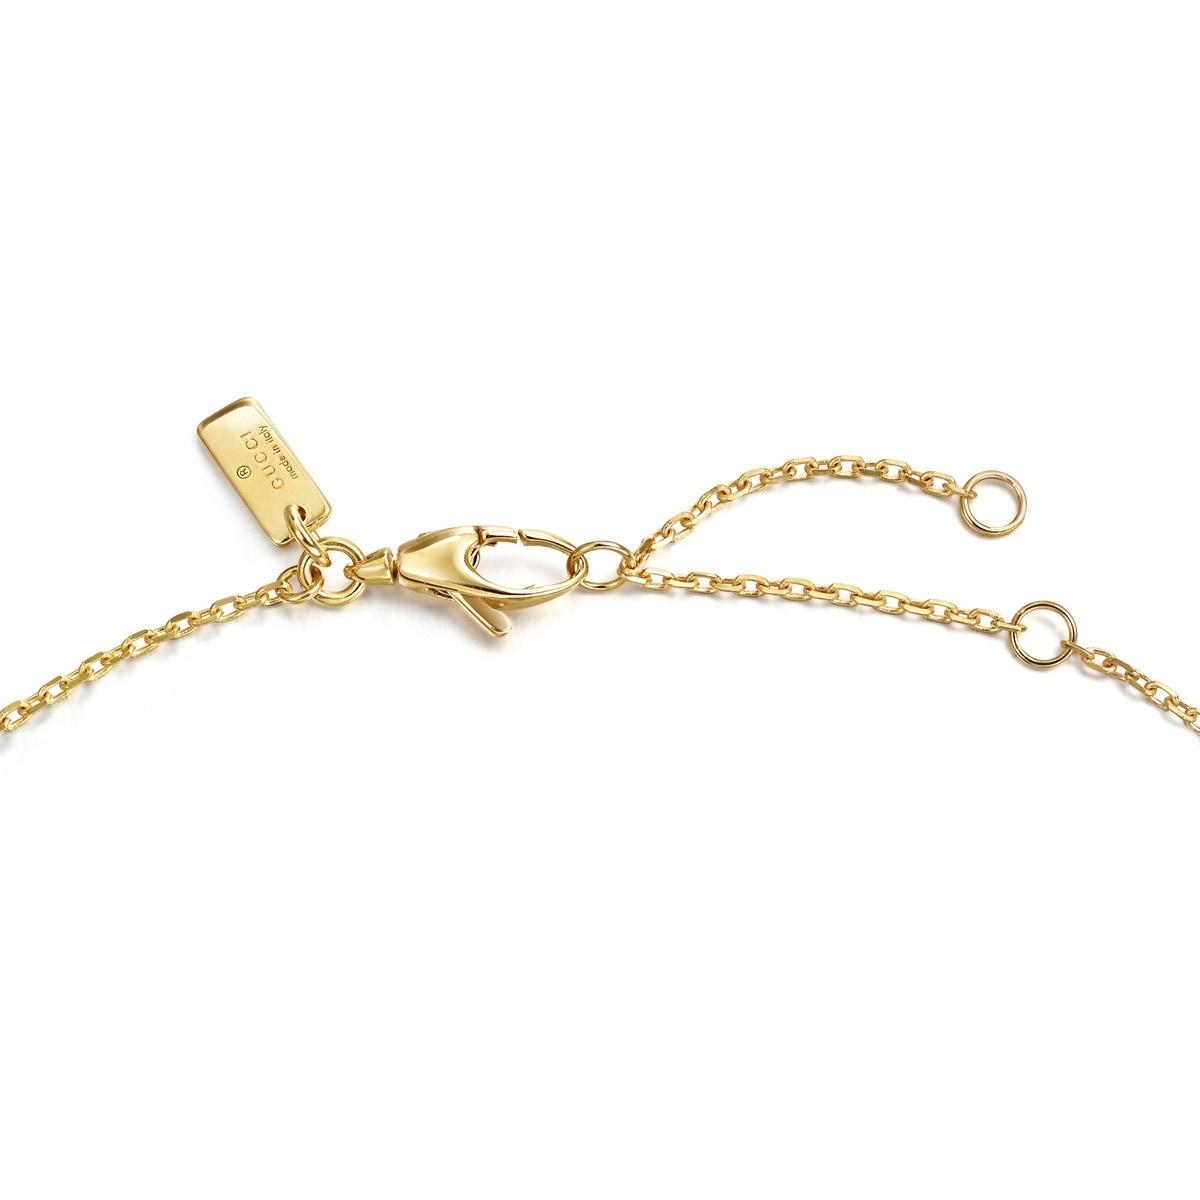 b85666cda1 Gucci Diamantissima 18K Gold Necklace   Chow Sang Sang Jewellery eShop